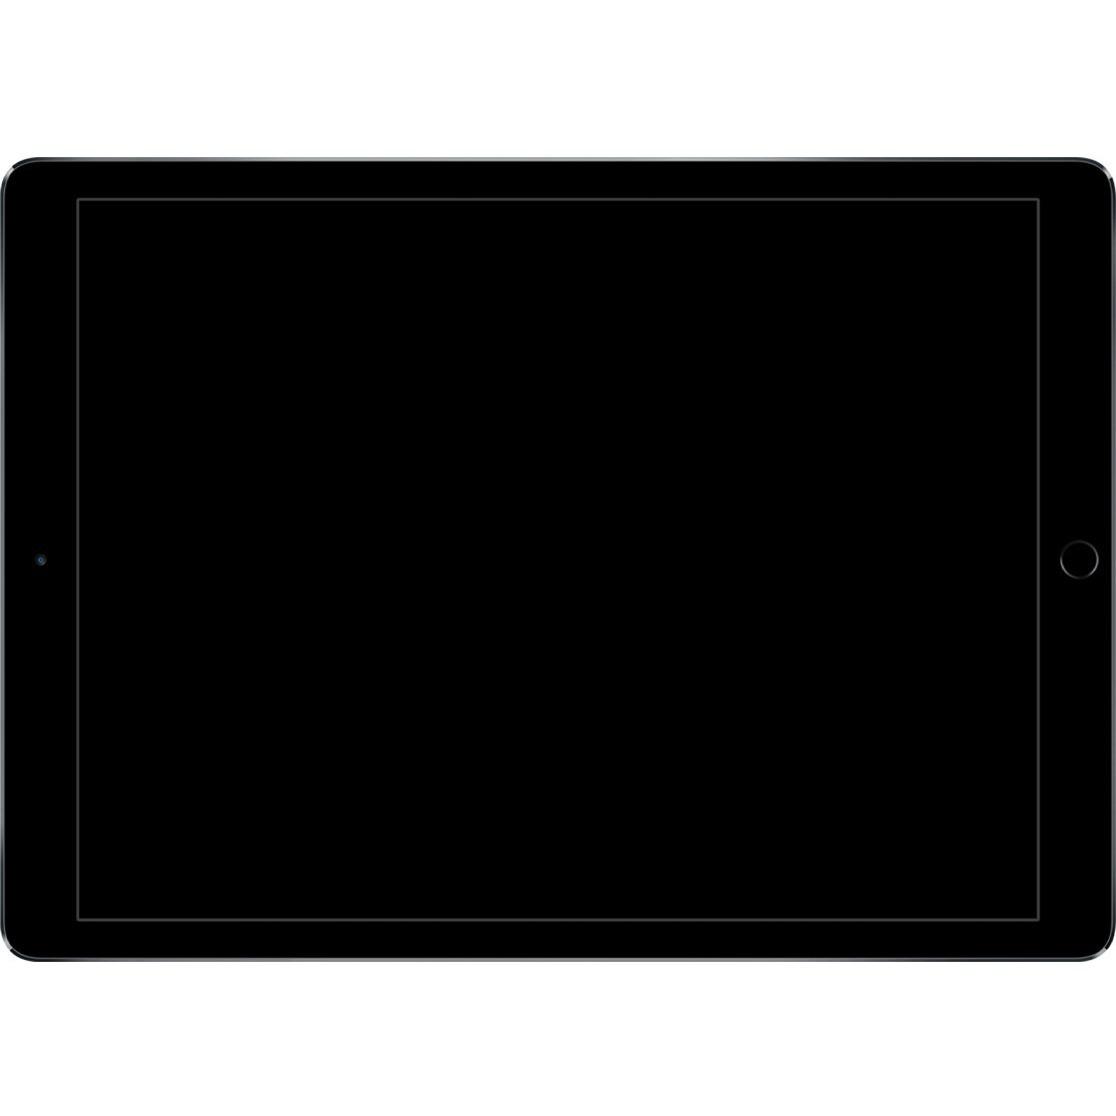 Apple iPad Pro Tablet - 32.8 cm 12.9inch - Apple A9X - 128 GB - iOS 9 - 2732 x 2048 - Retina Display - 4G